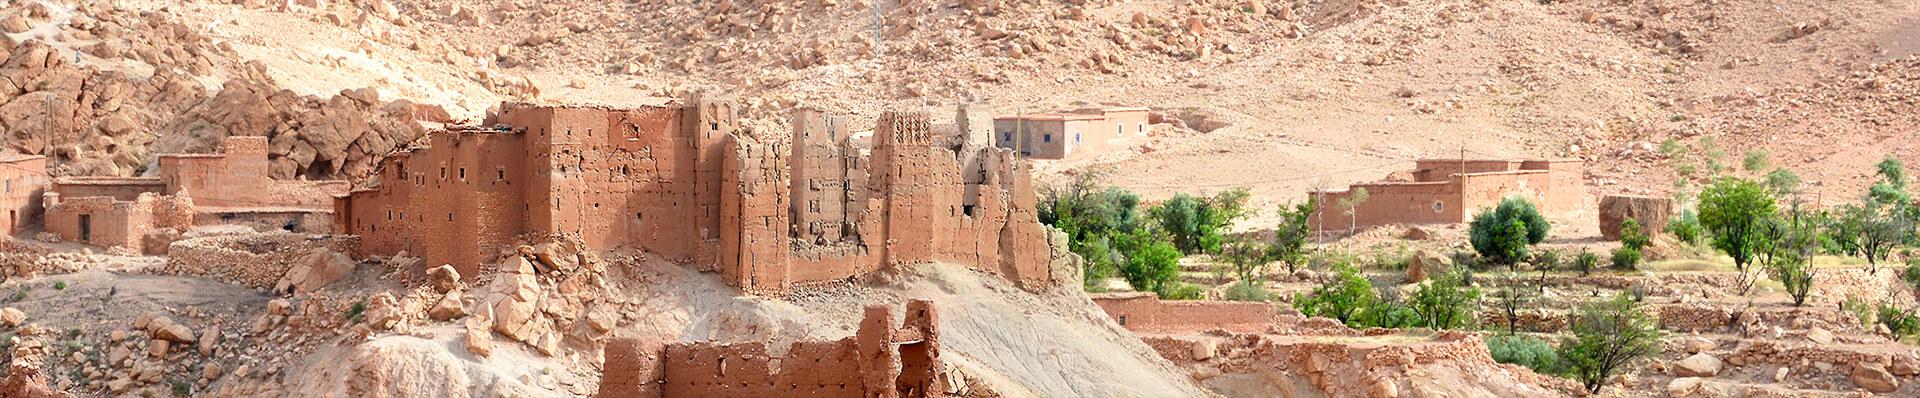 offre riad boutique hôtel Dar Housnia à Marrakech